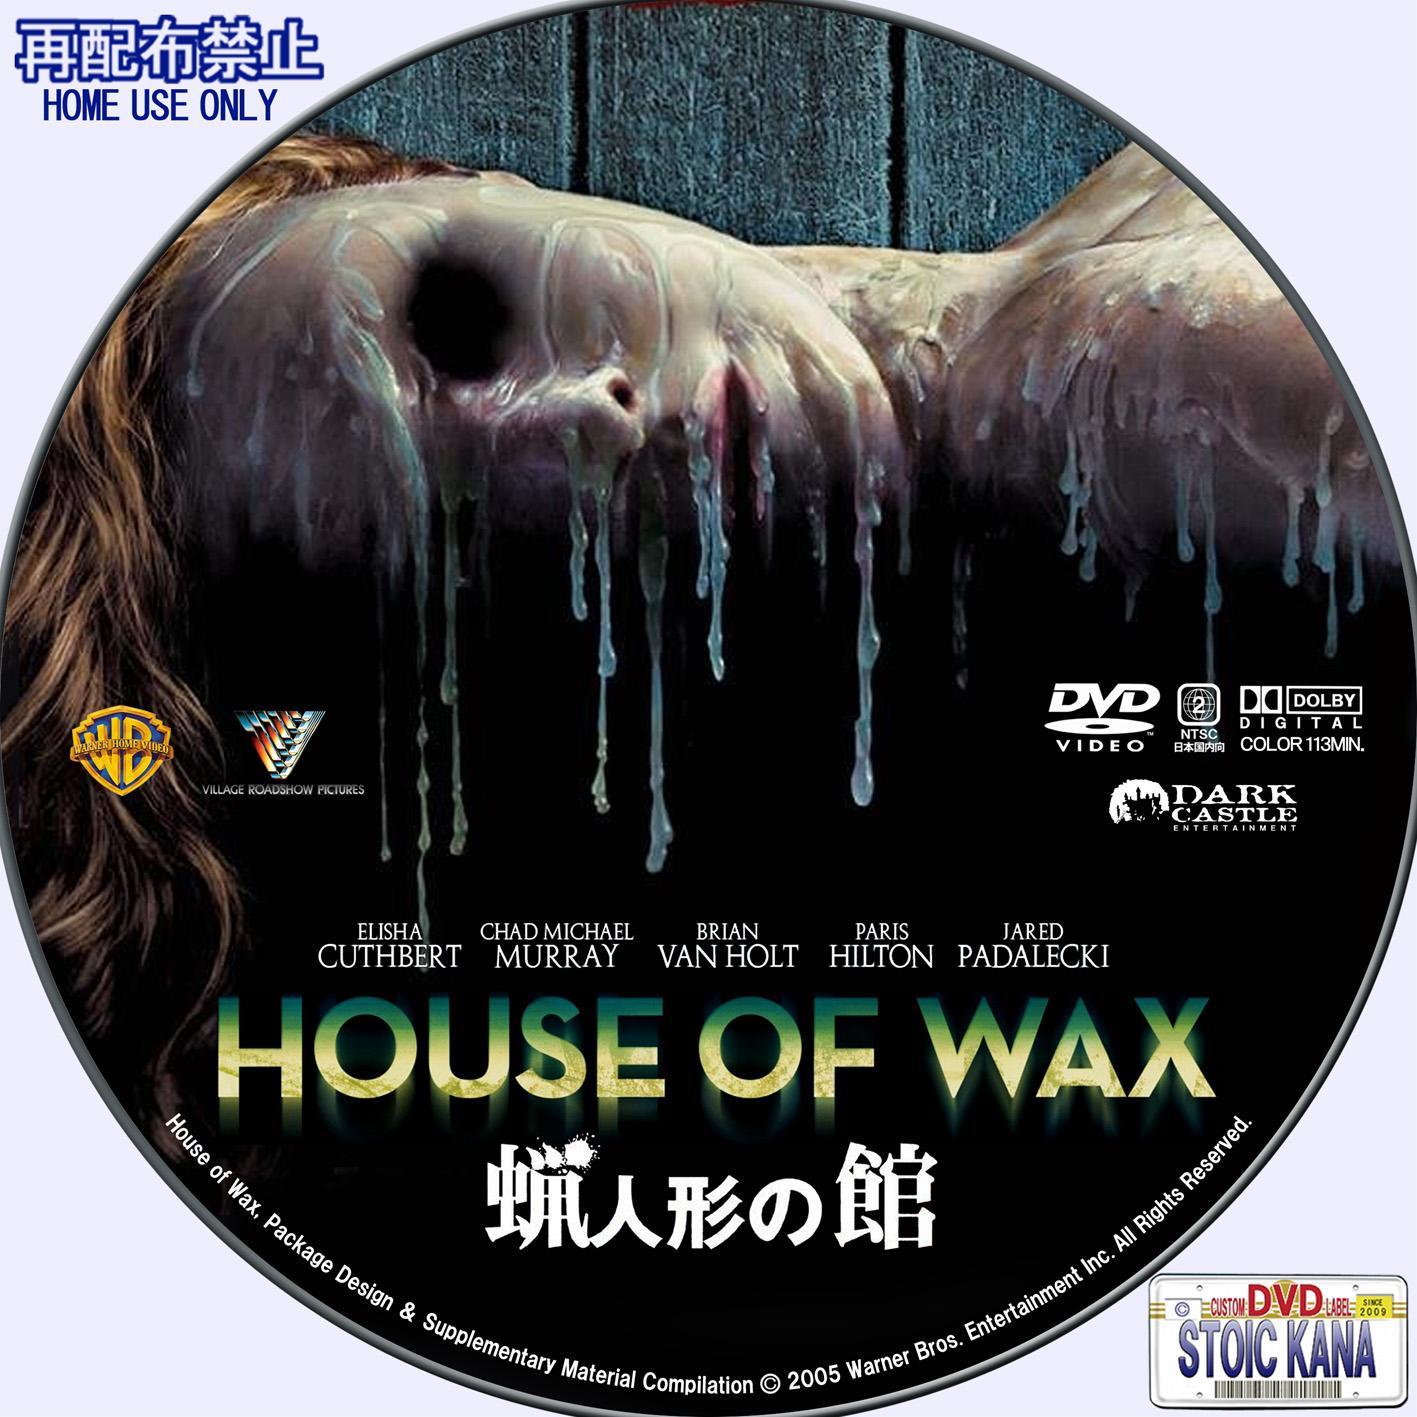 Stoic Kana S Label Dvd